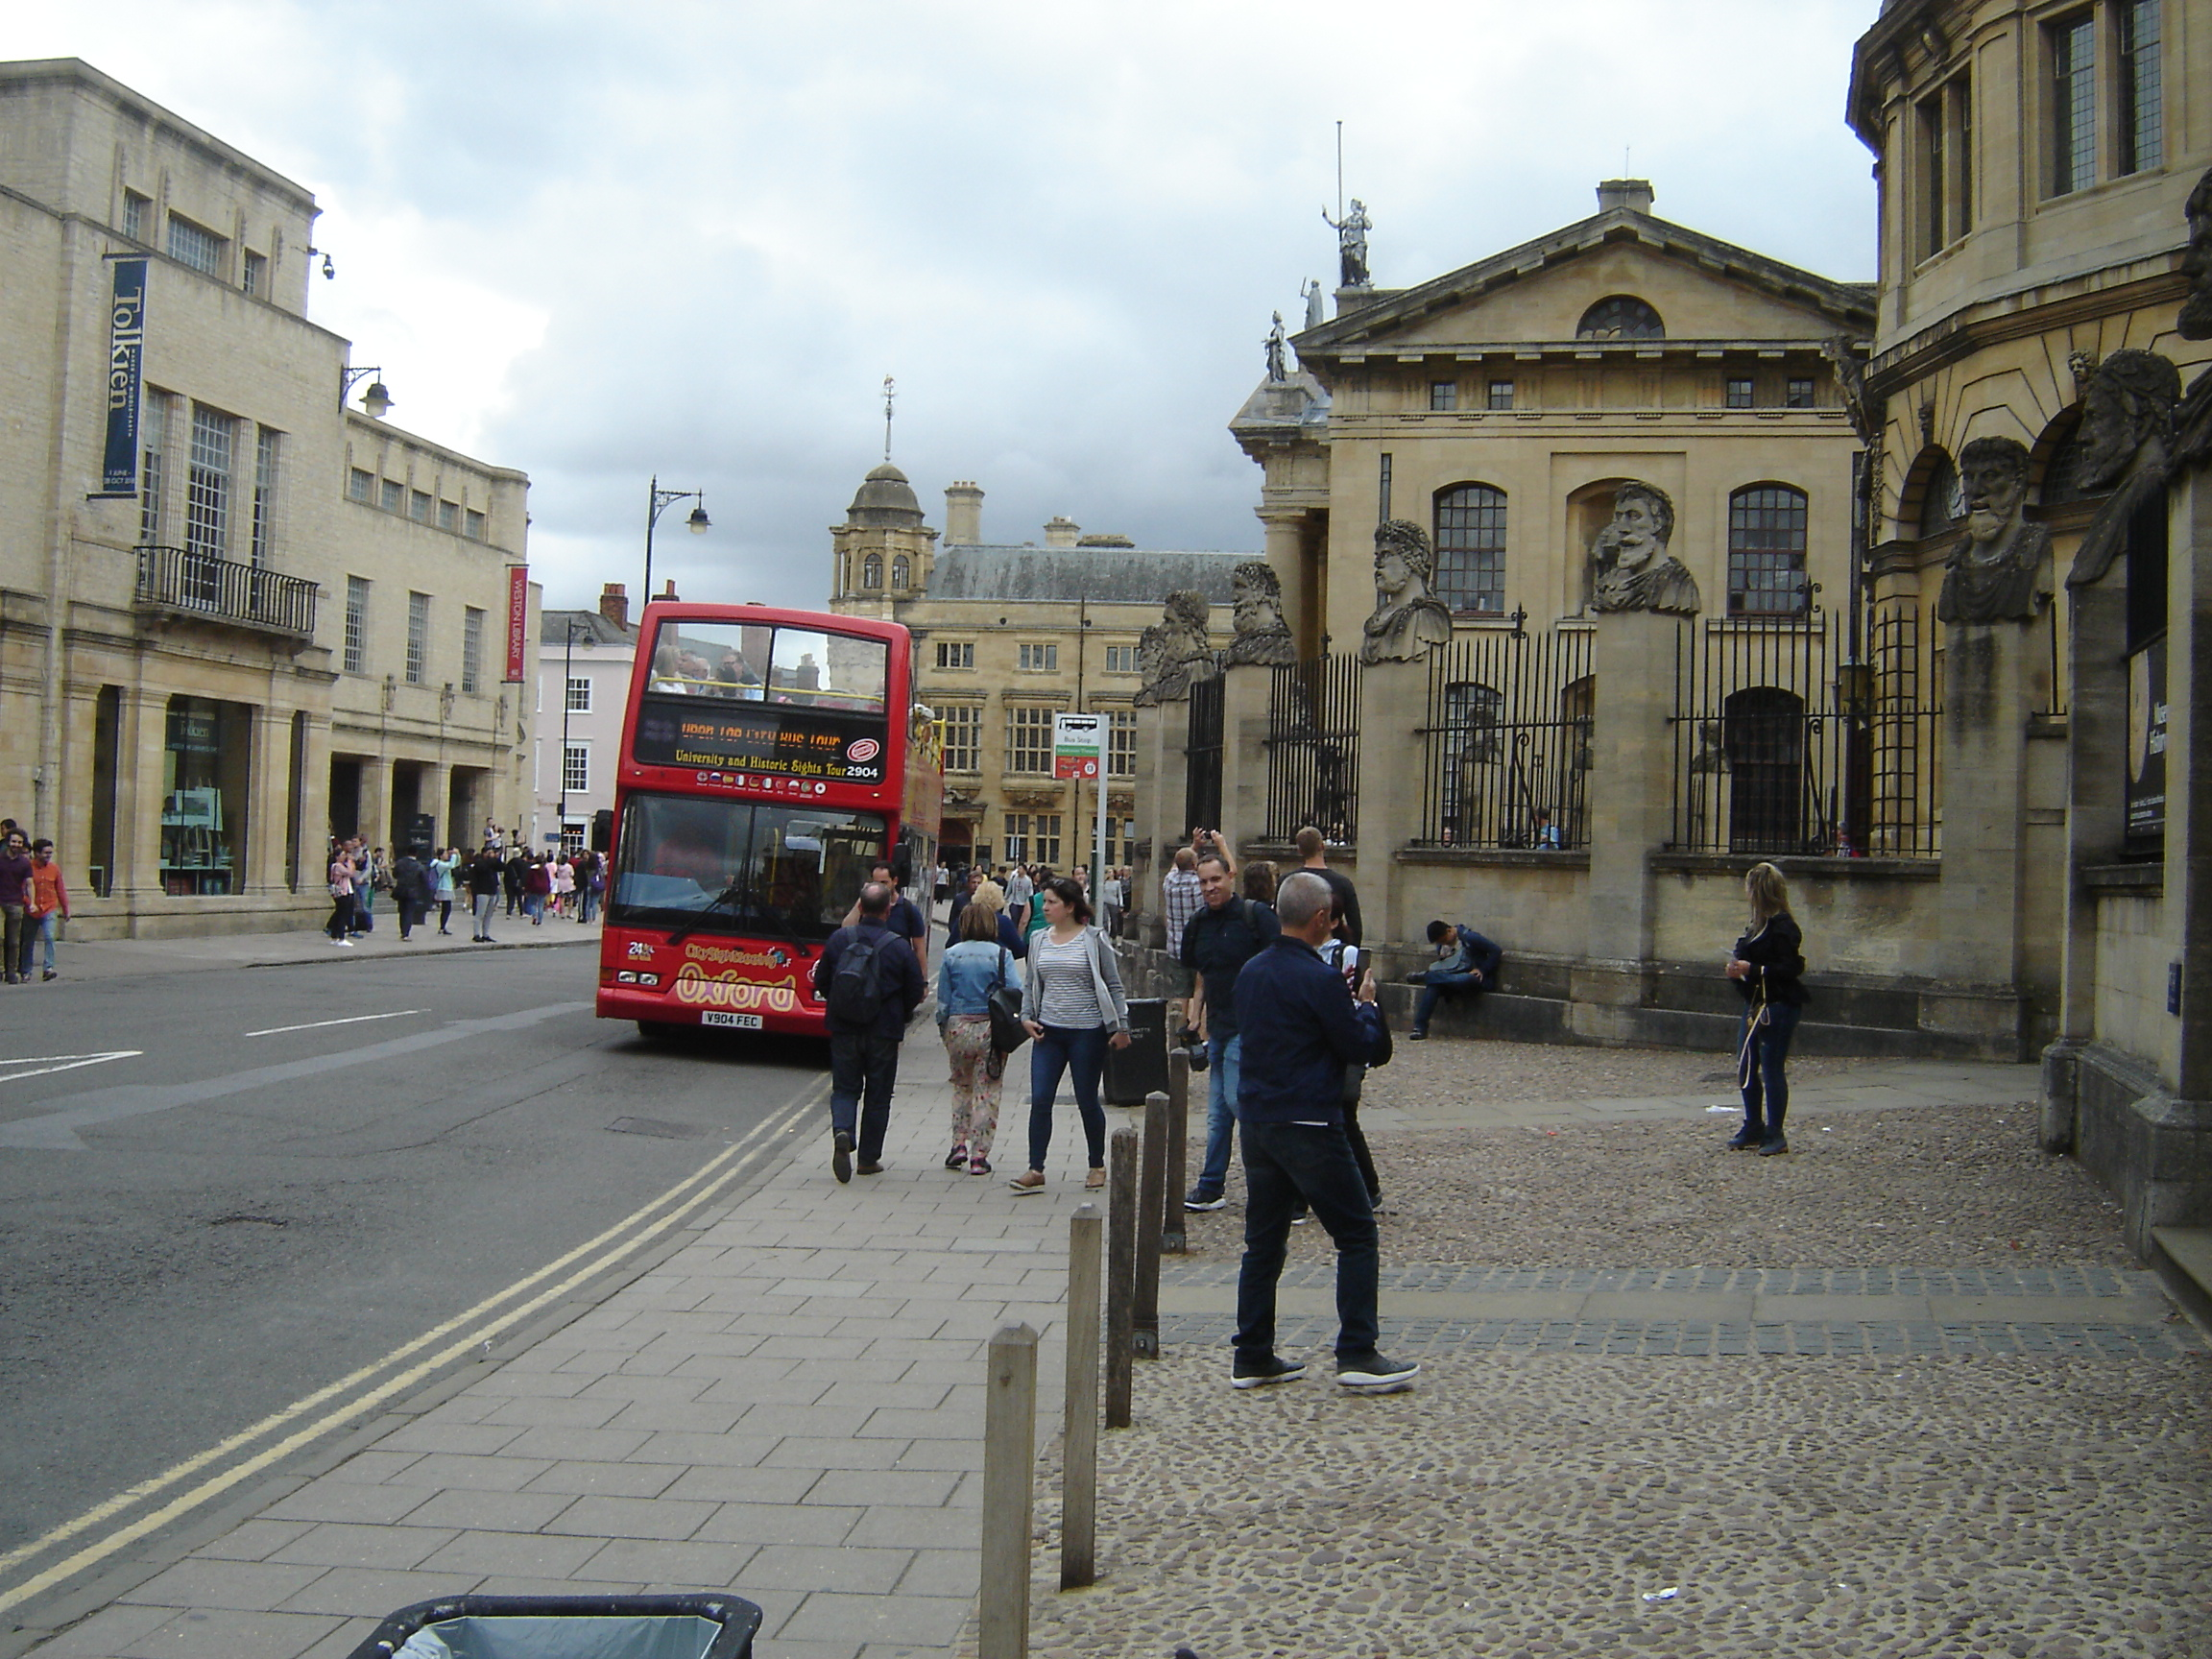 Drab people in Broad Street, Oxford